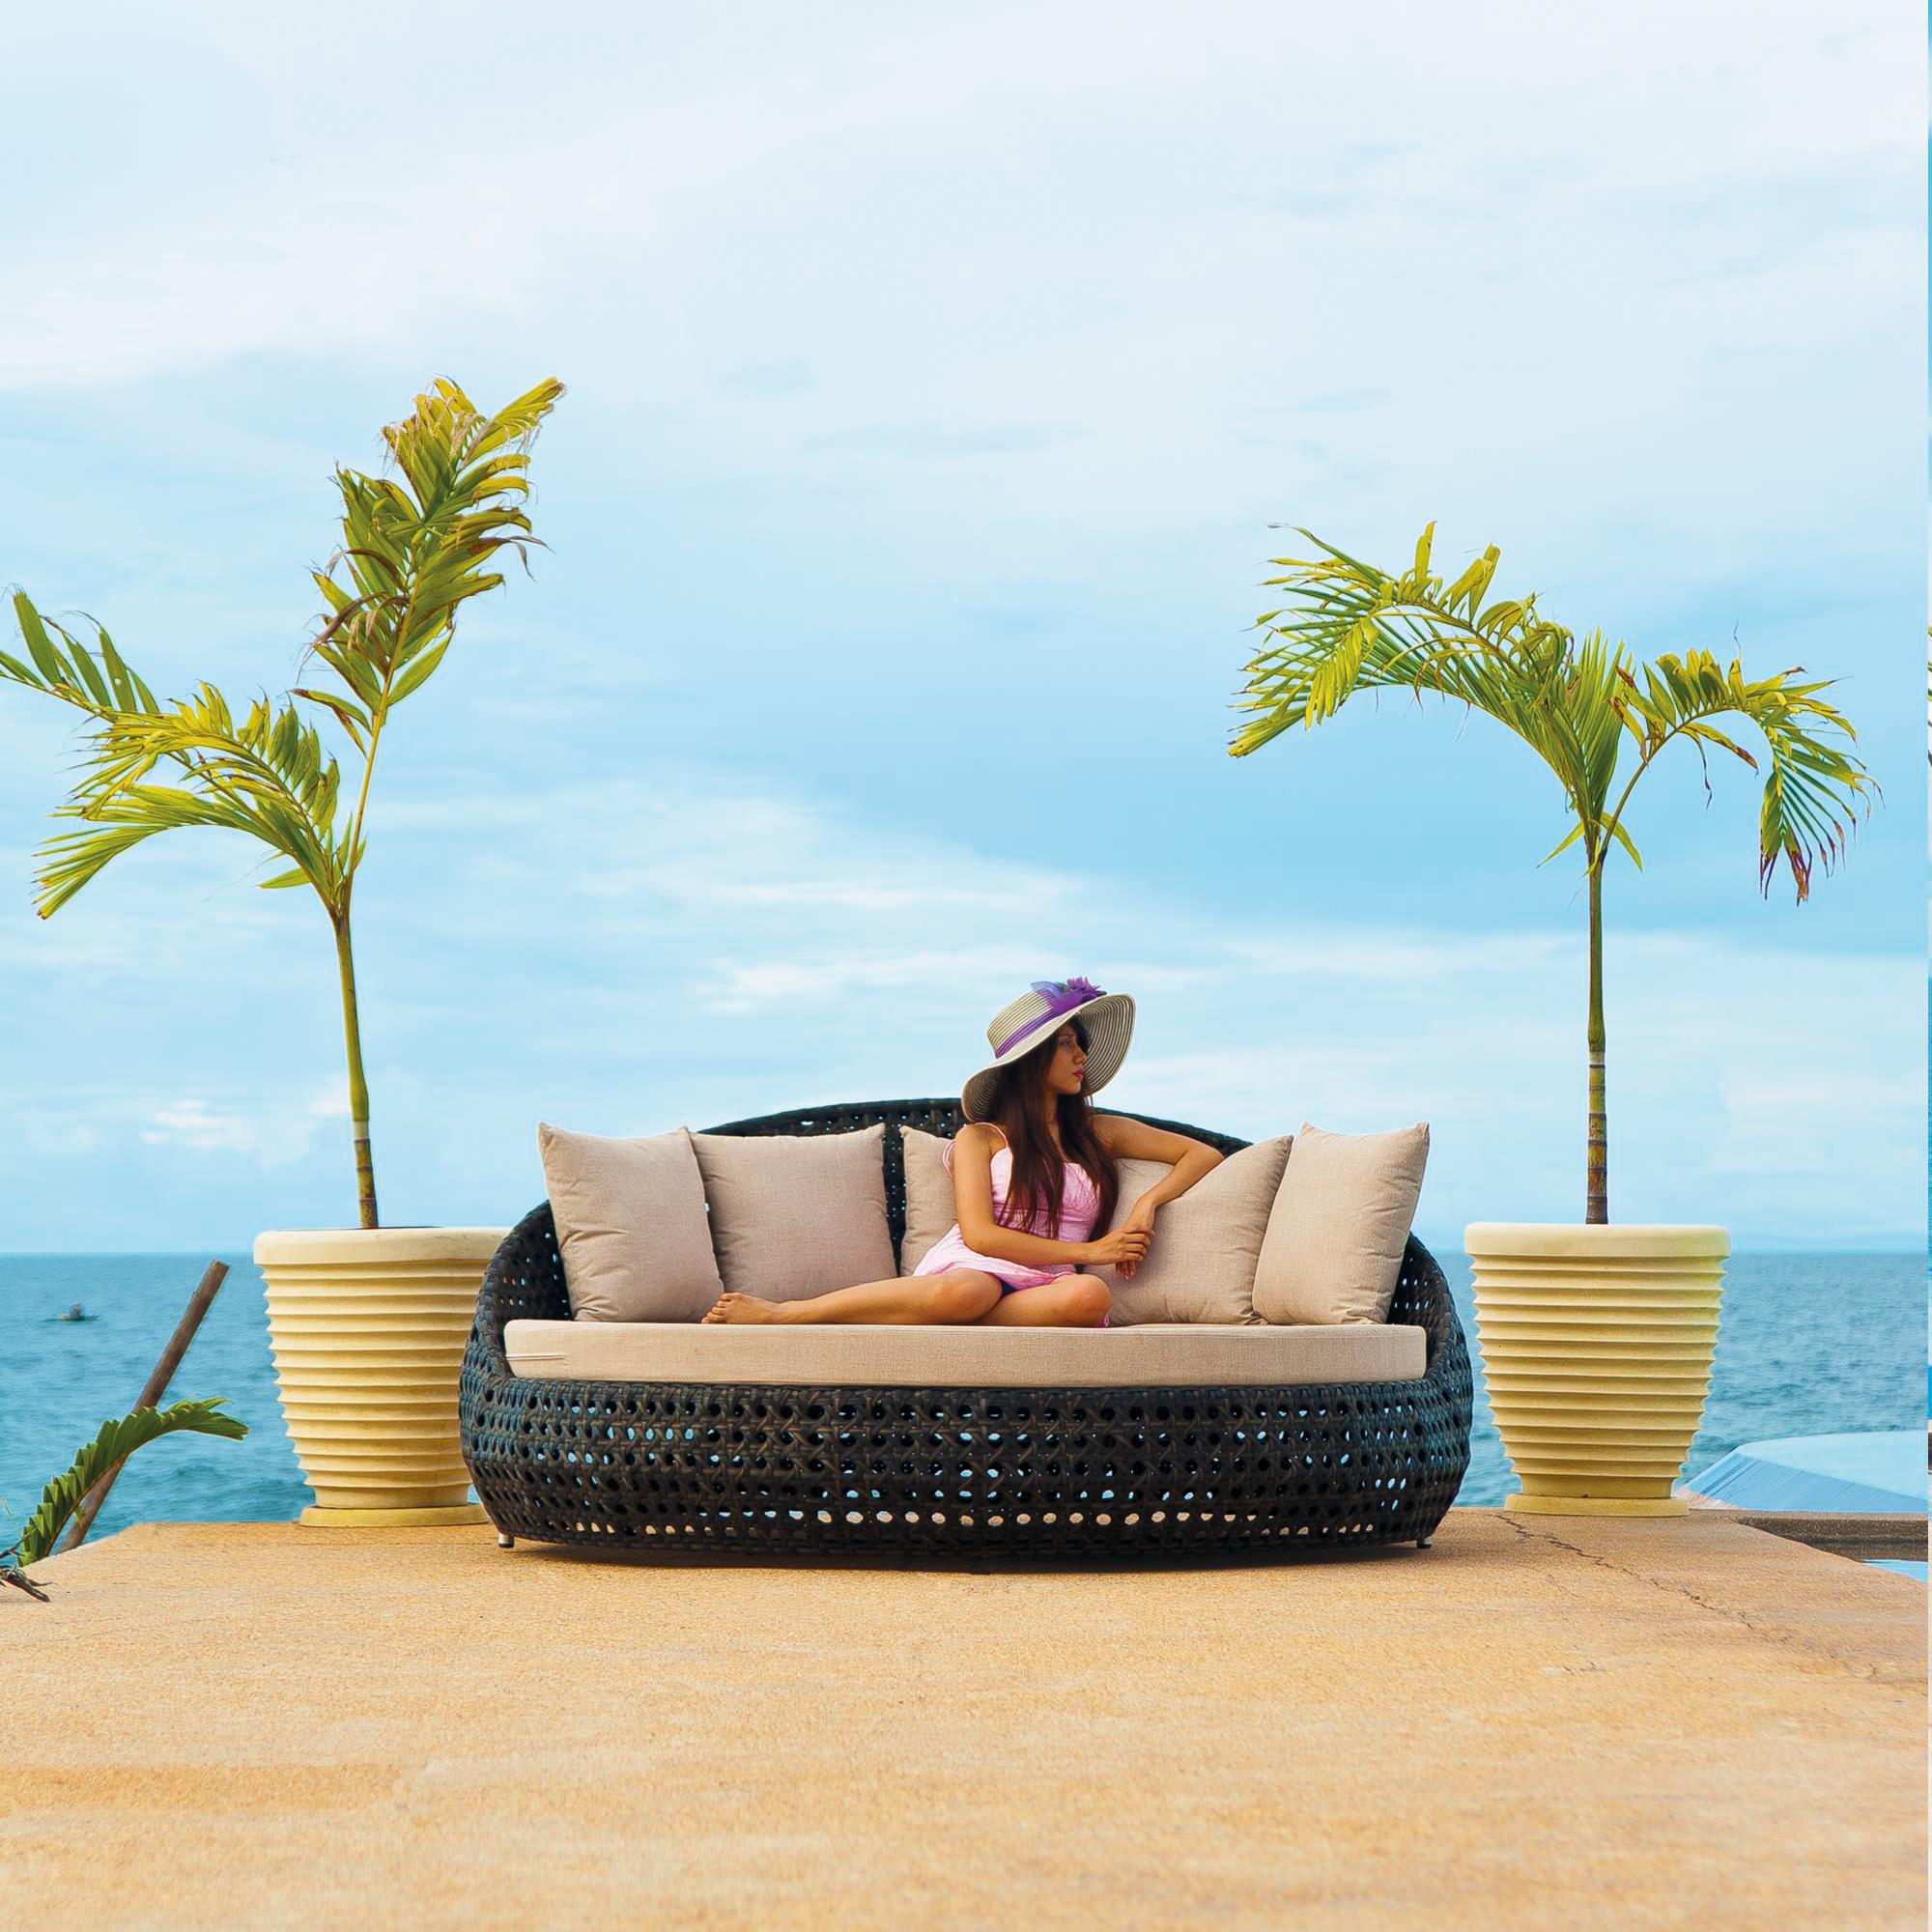 code fiche produit 5989420. Black Bedroom Furniture Sets. Home Design Ideas